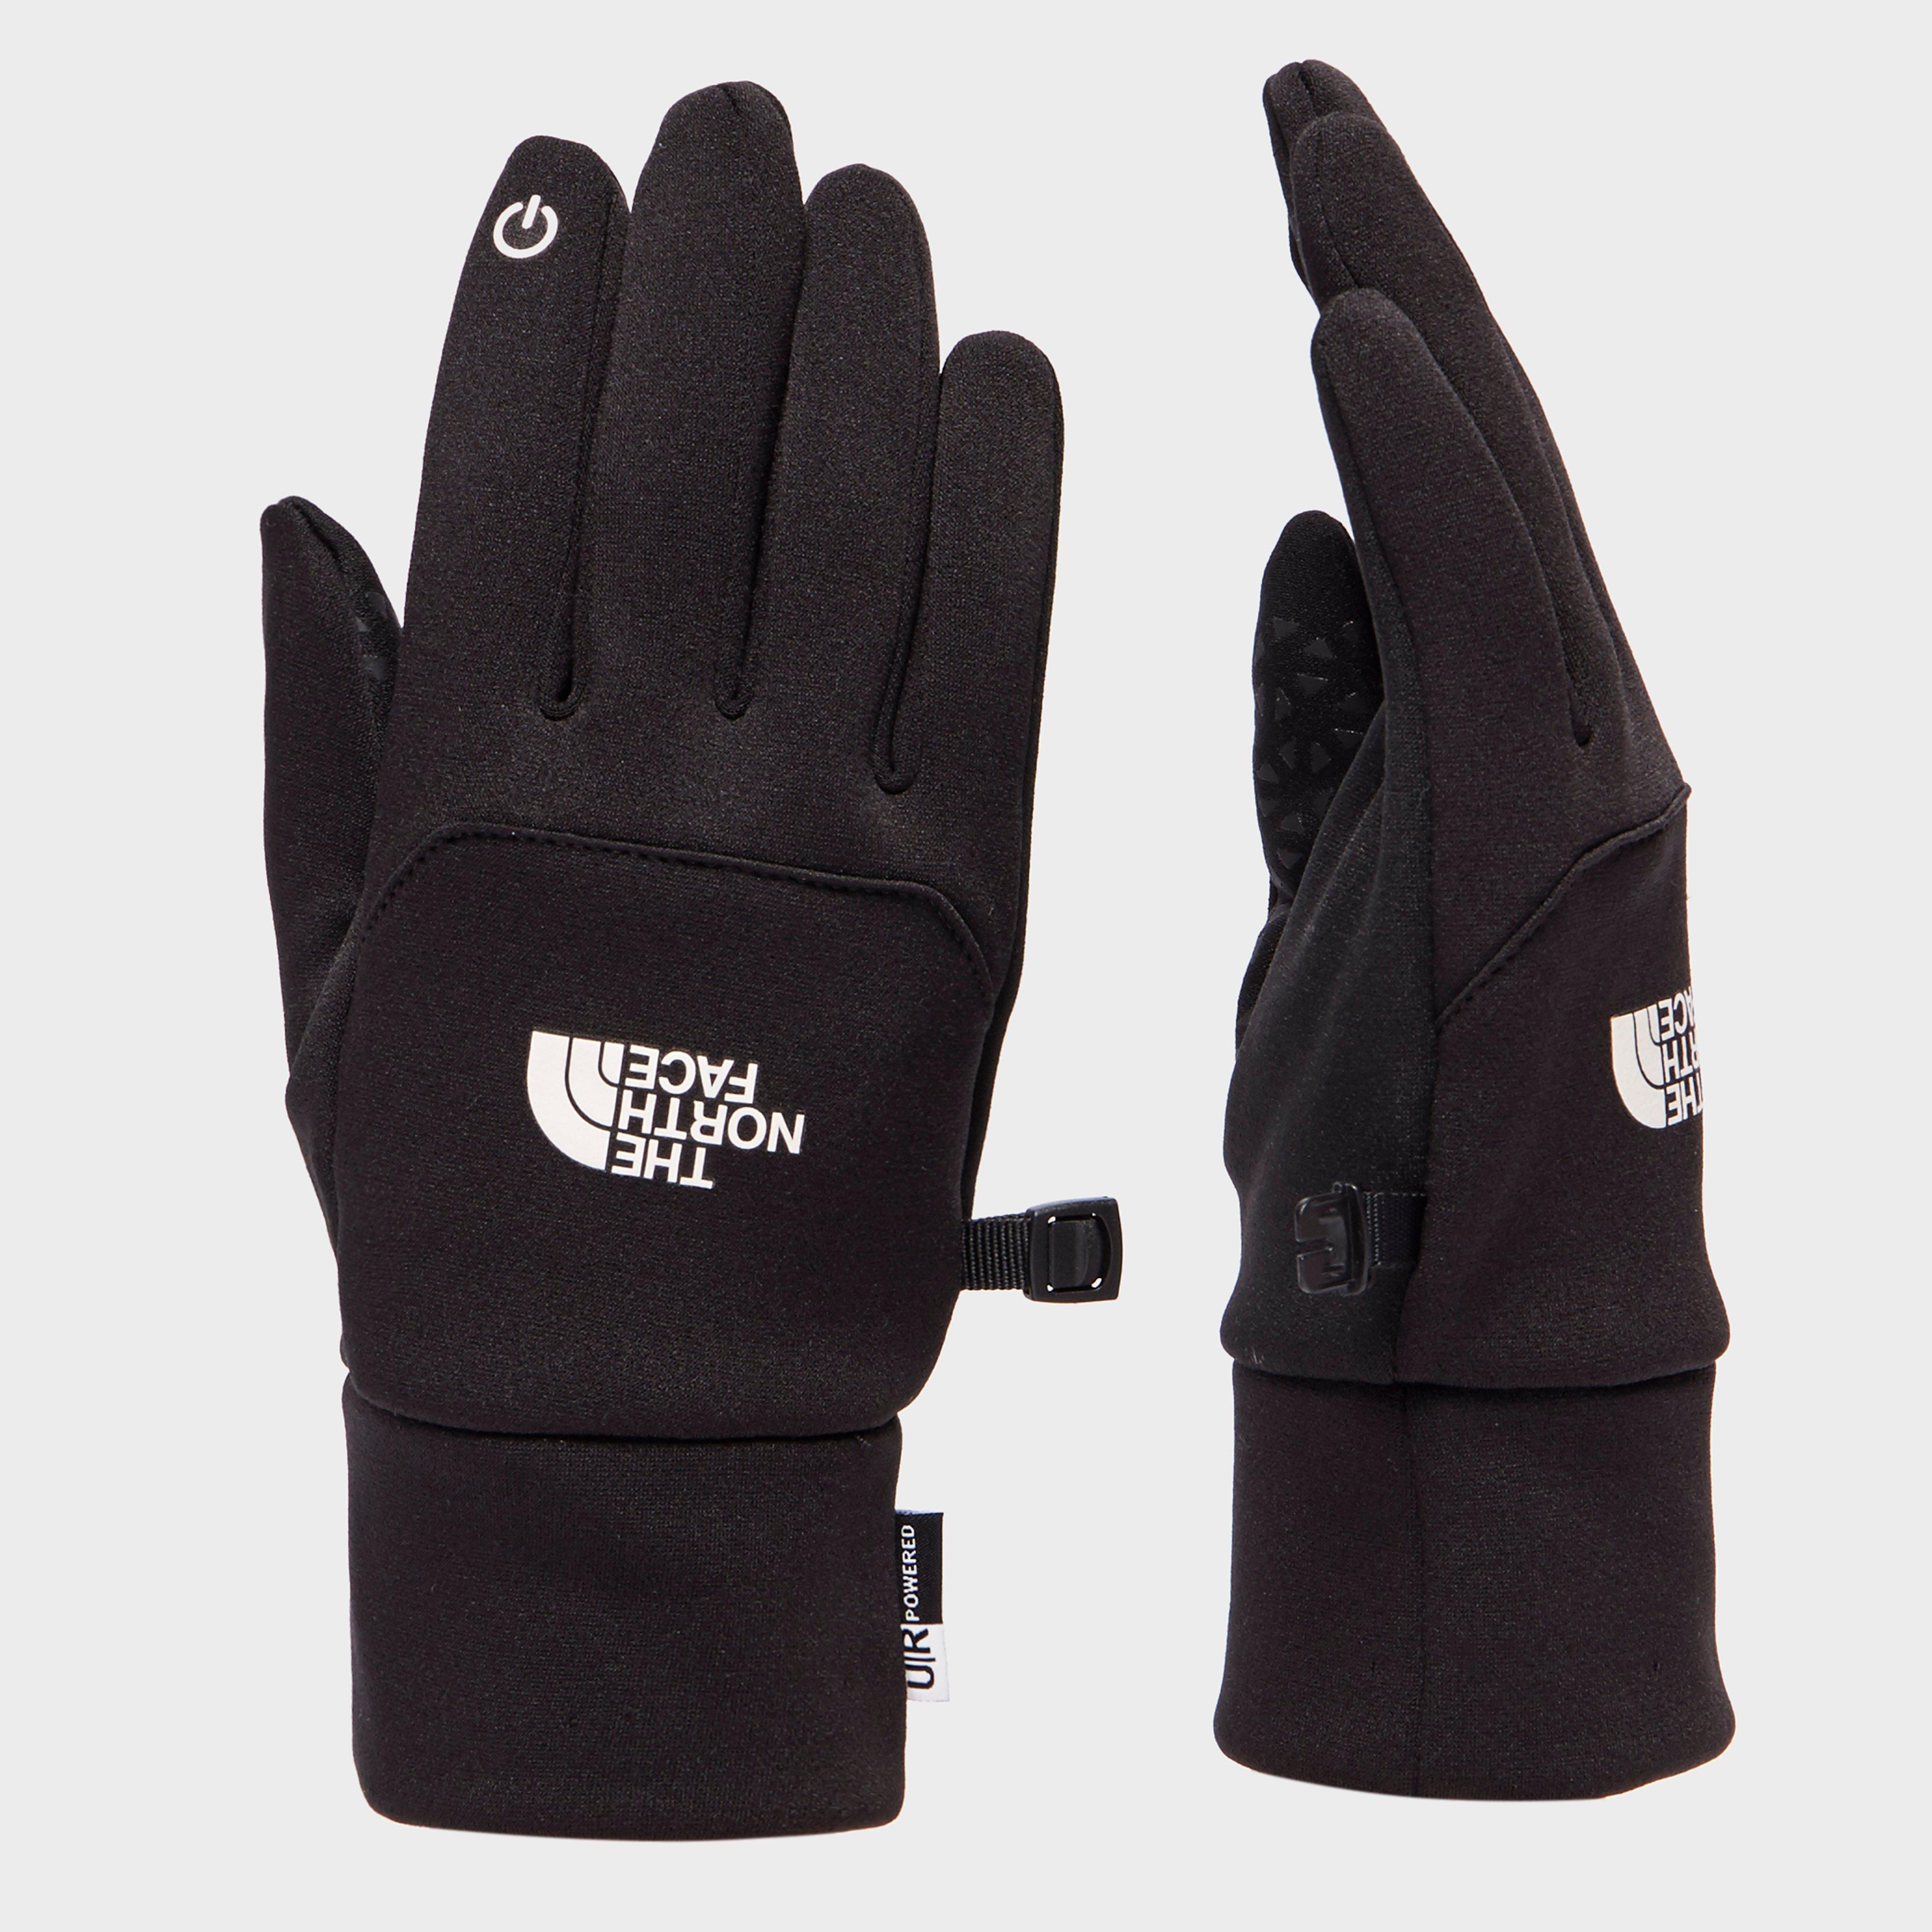 a1a24eaee Men's Etip Gloves